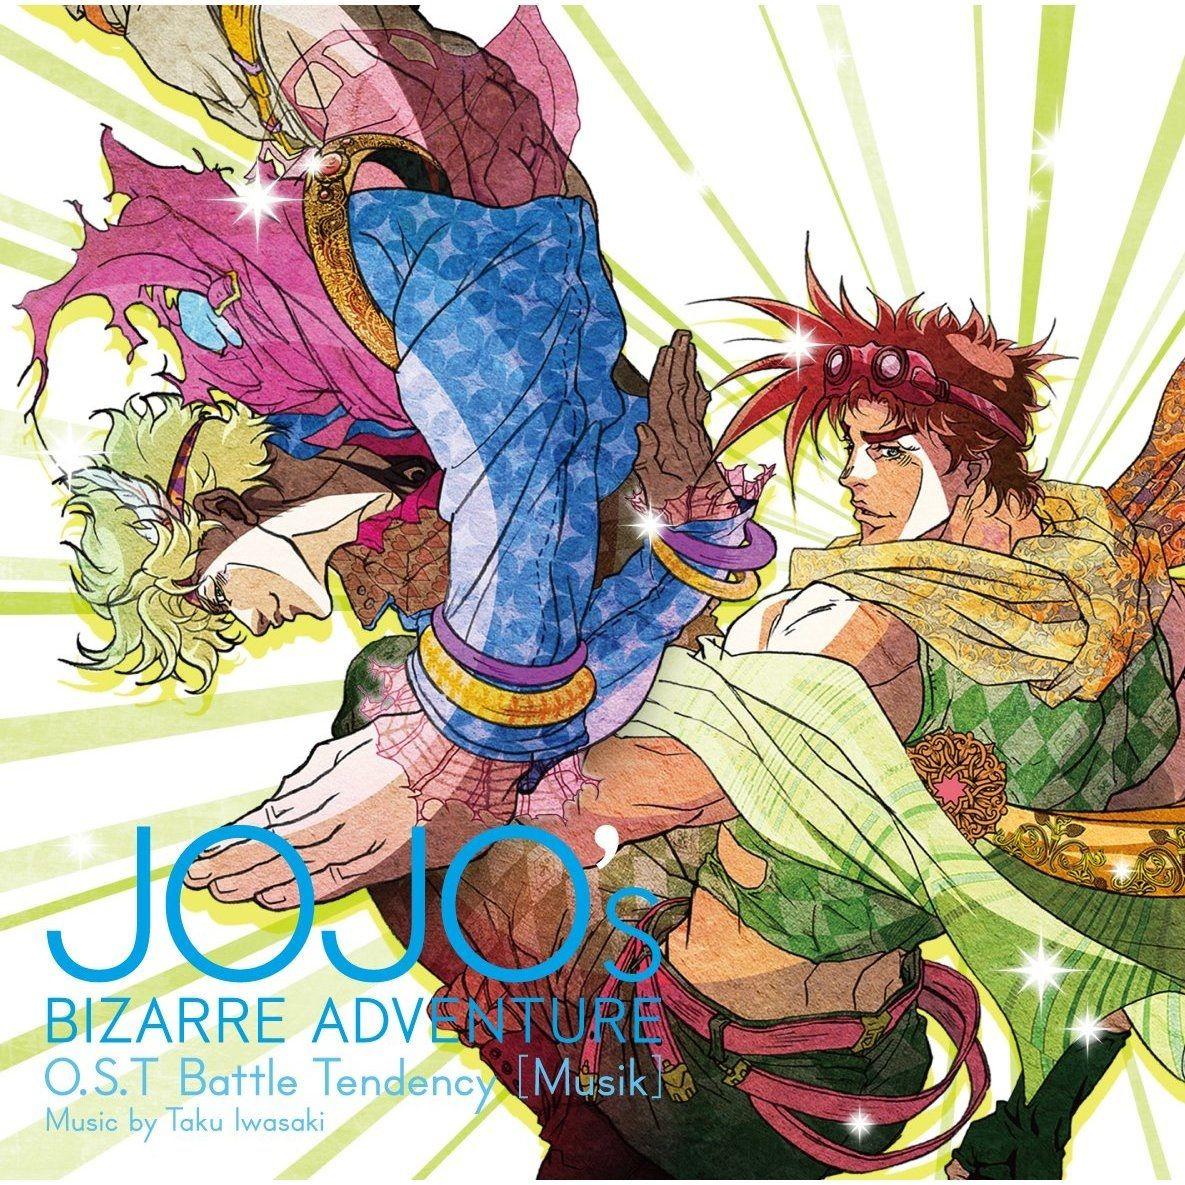 Pin by Marine Scientia on Anime (*゚ ゚)ノ Jojo bizarre